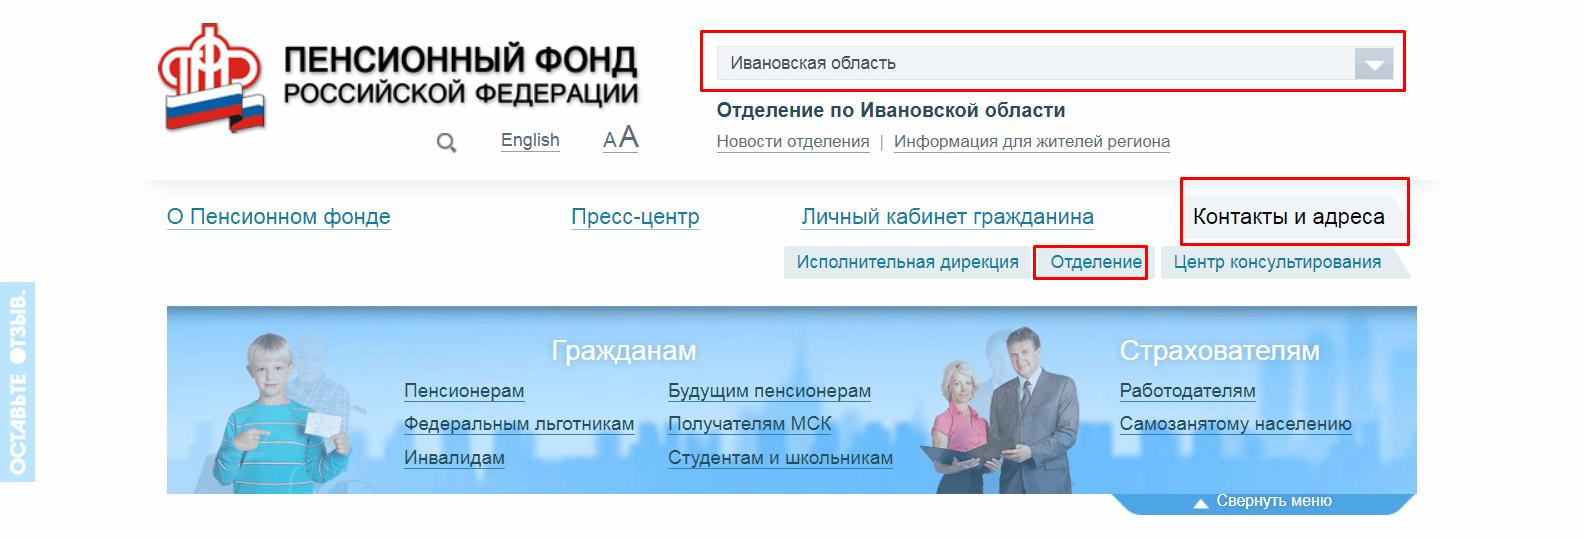 Пенсионный фонд Иваново